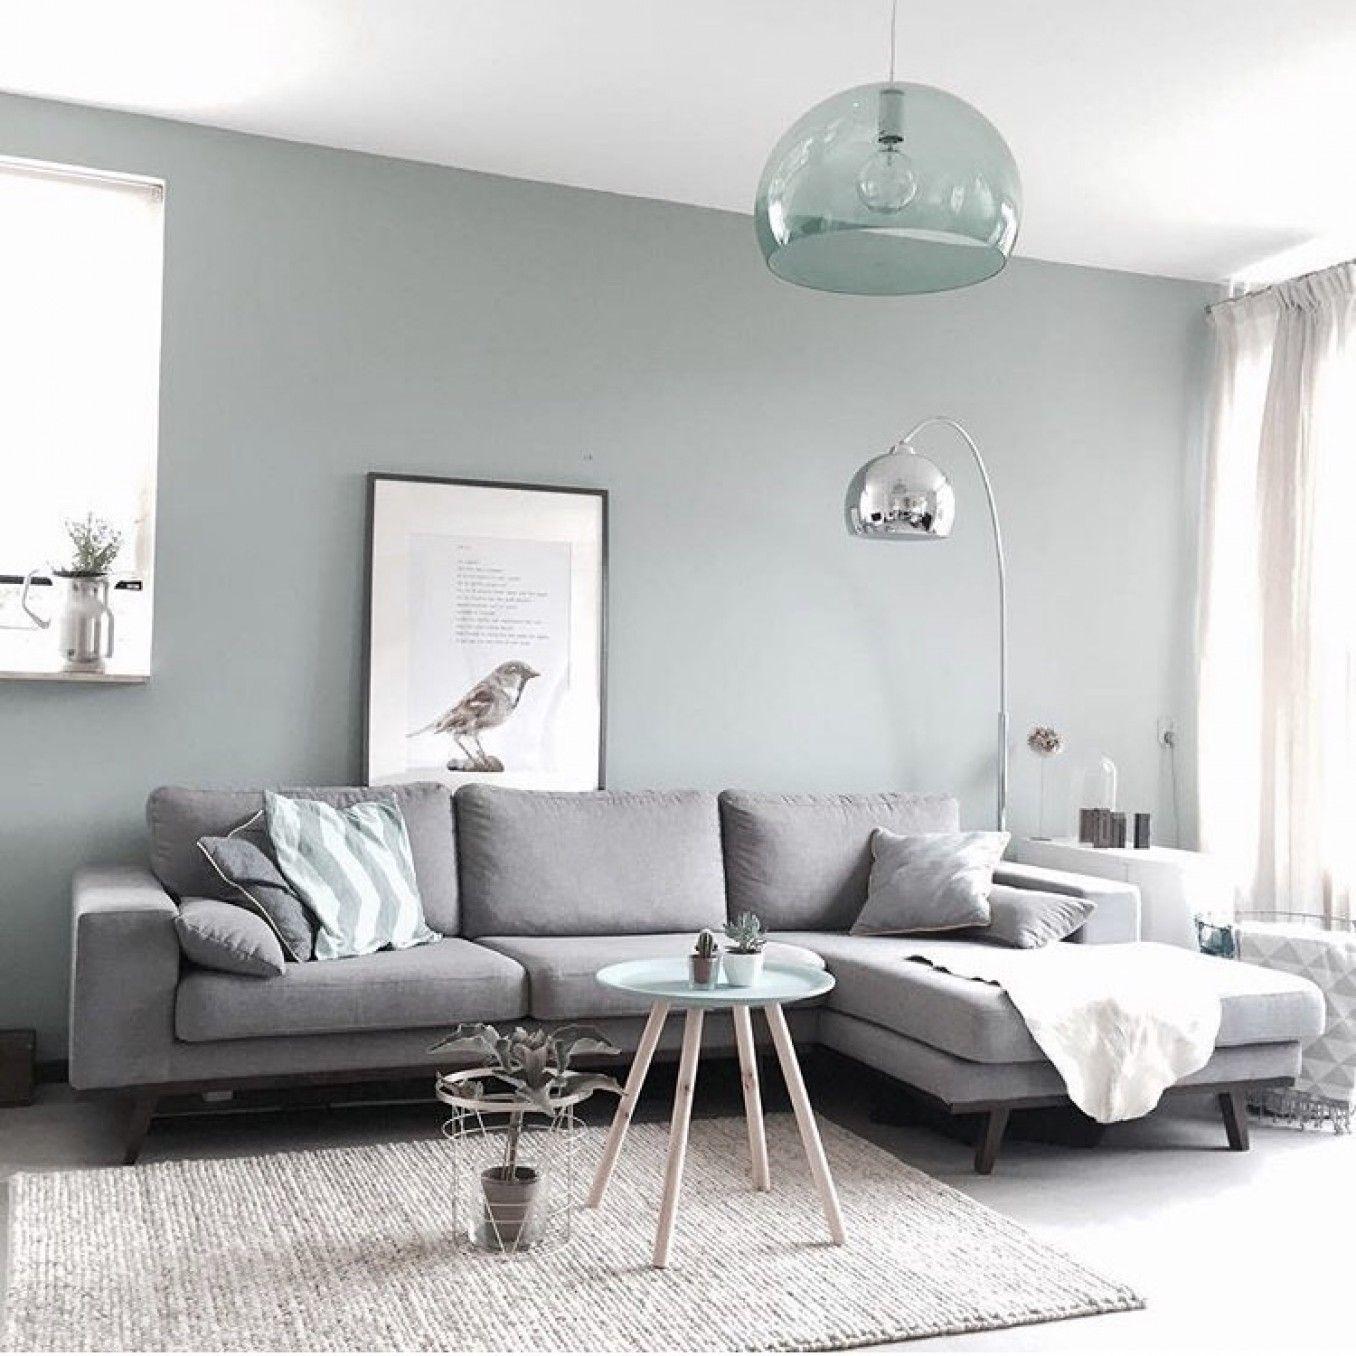 Woonkamer idee n voor het huis pinterest huiskamer for Huis interieur ideeen